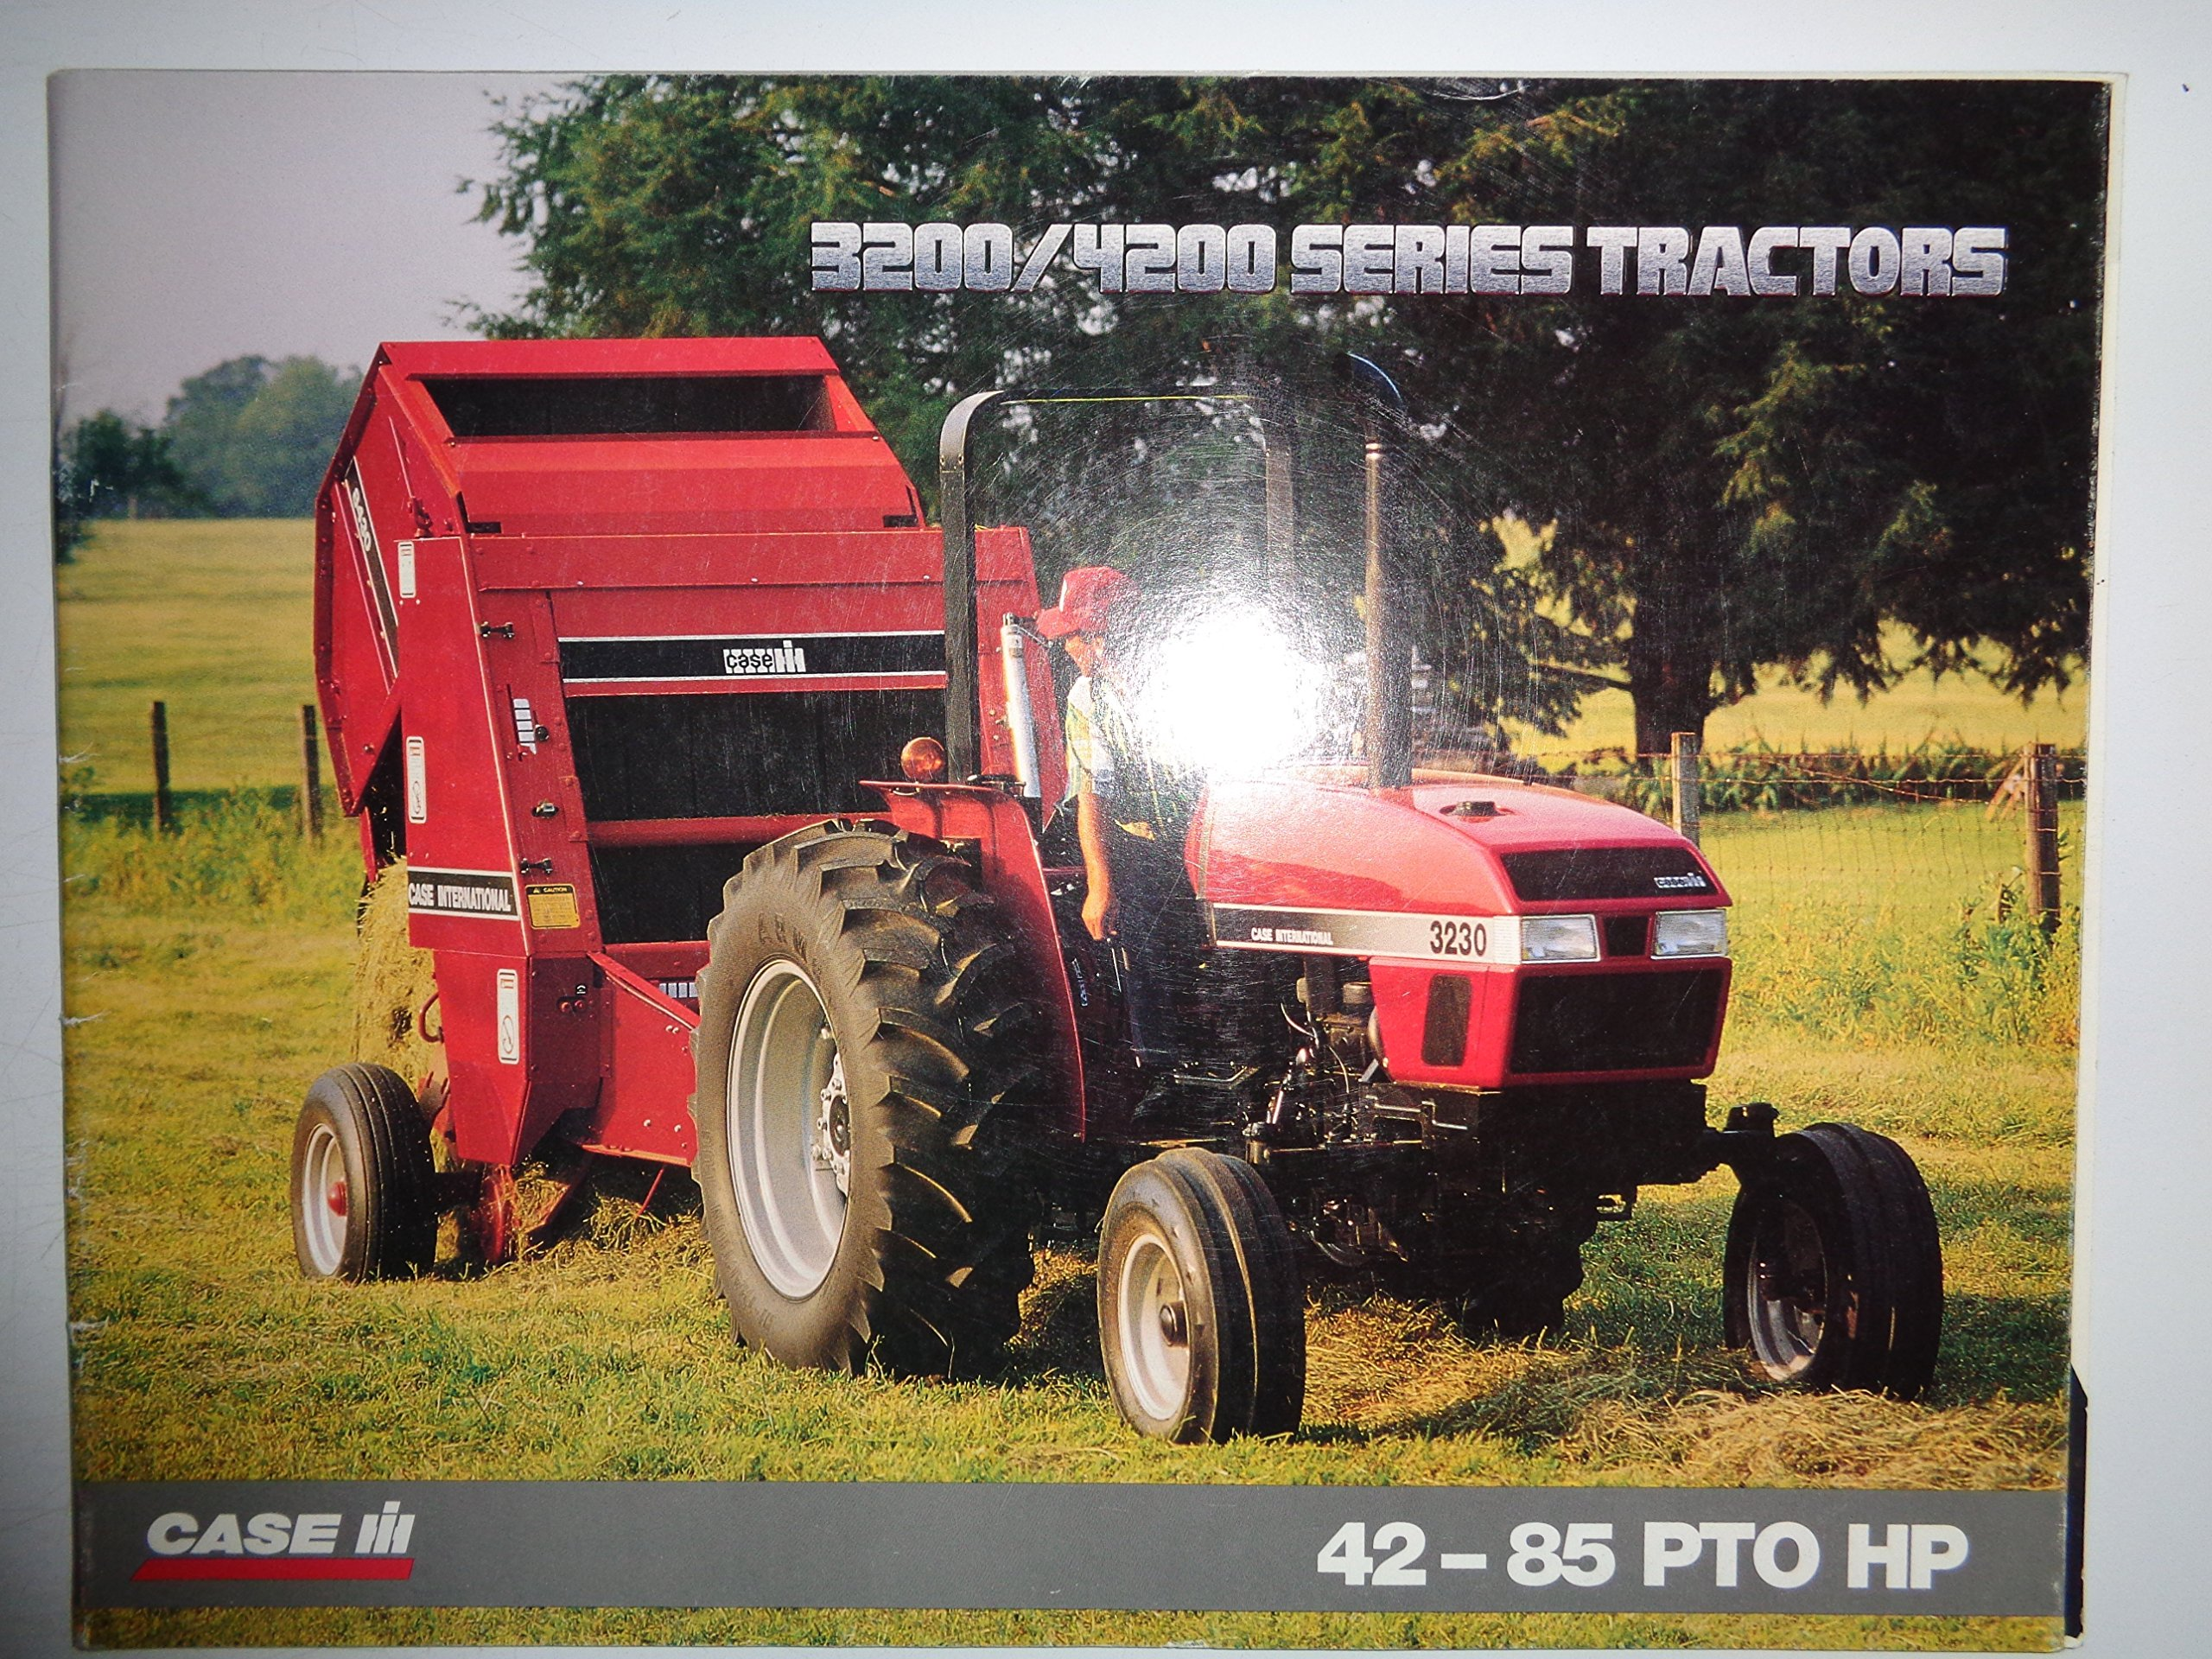 Case ih 3220 4230 3230 4240 4210 tractor sales brochure ae082094 case ih 3220 4230 3230 4240 4210 tractor sales brochure ae082094 cih case international amazon books fandeluxe Gallery